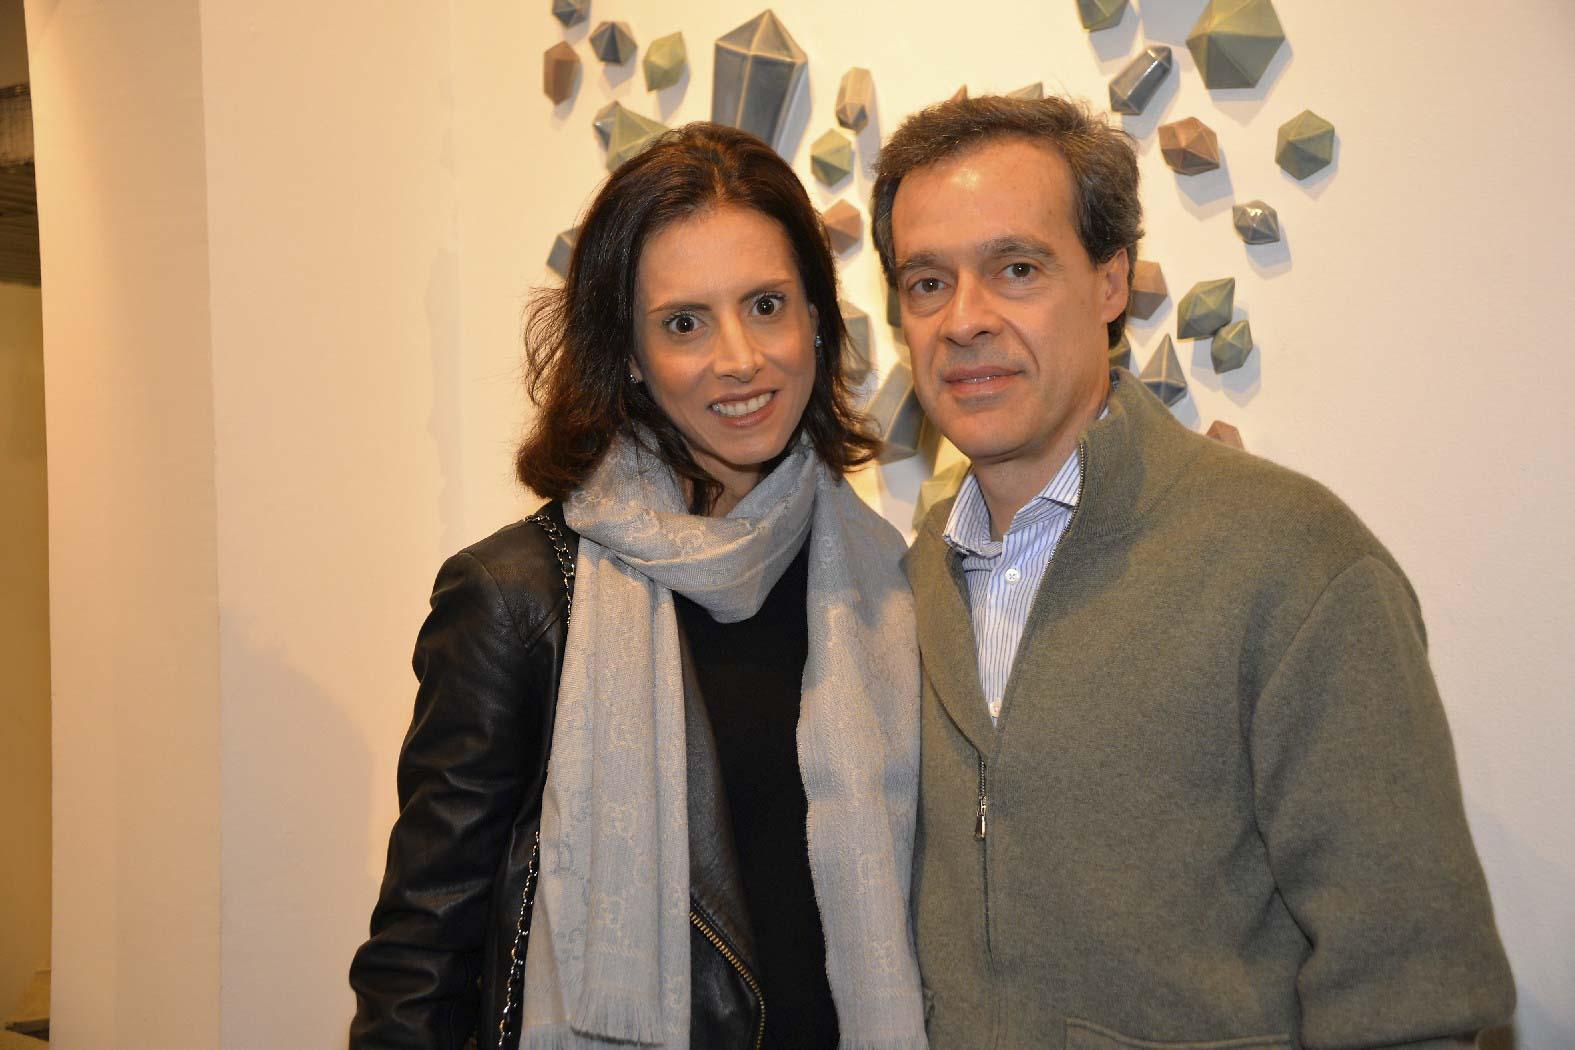 Leticia Giannini e Bento Moreira Franco (2)